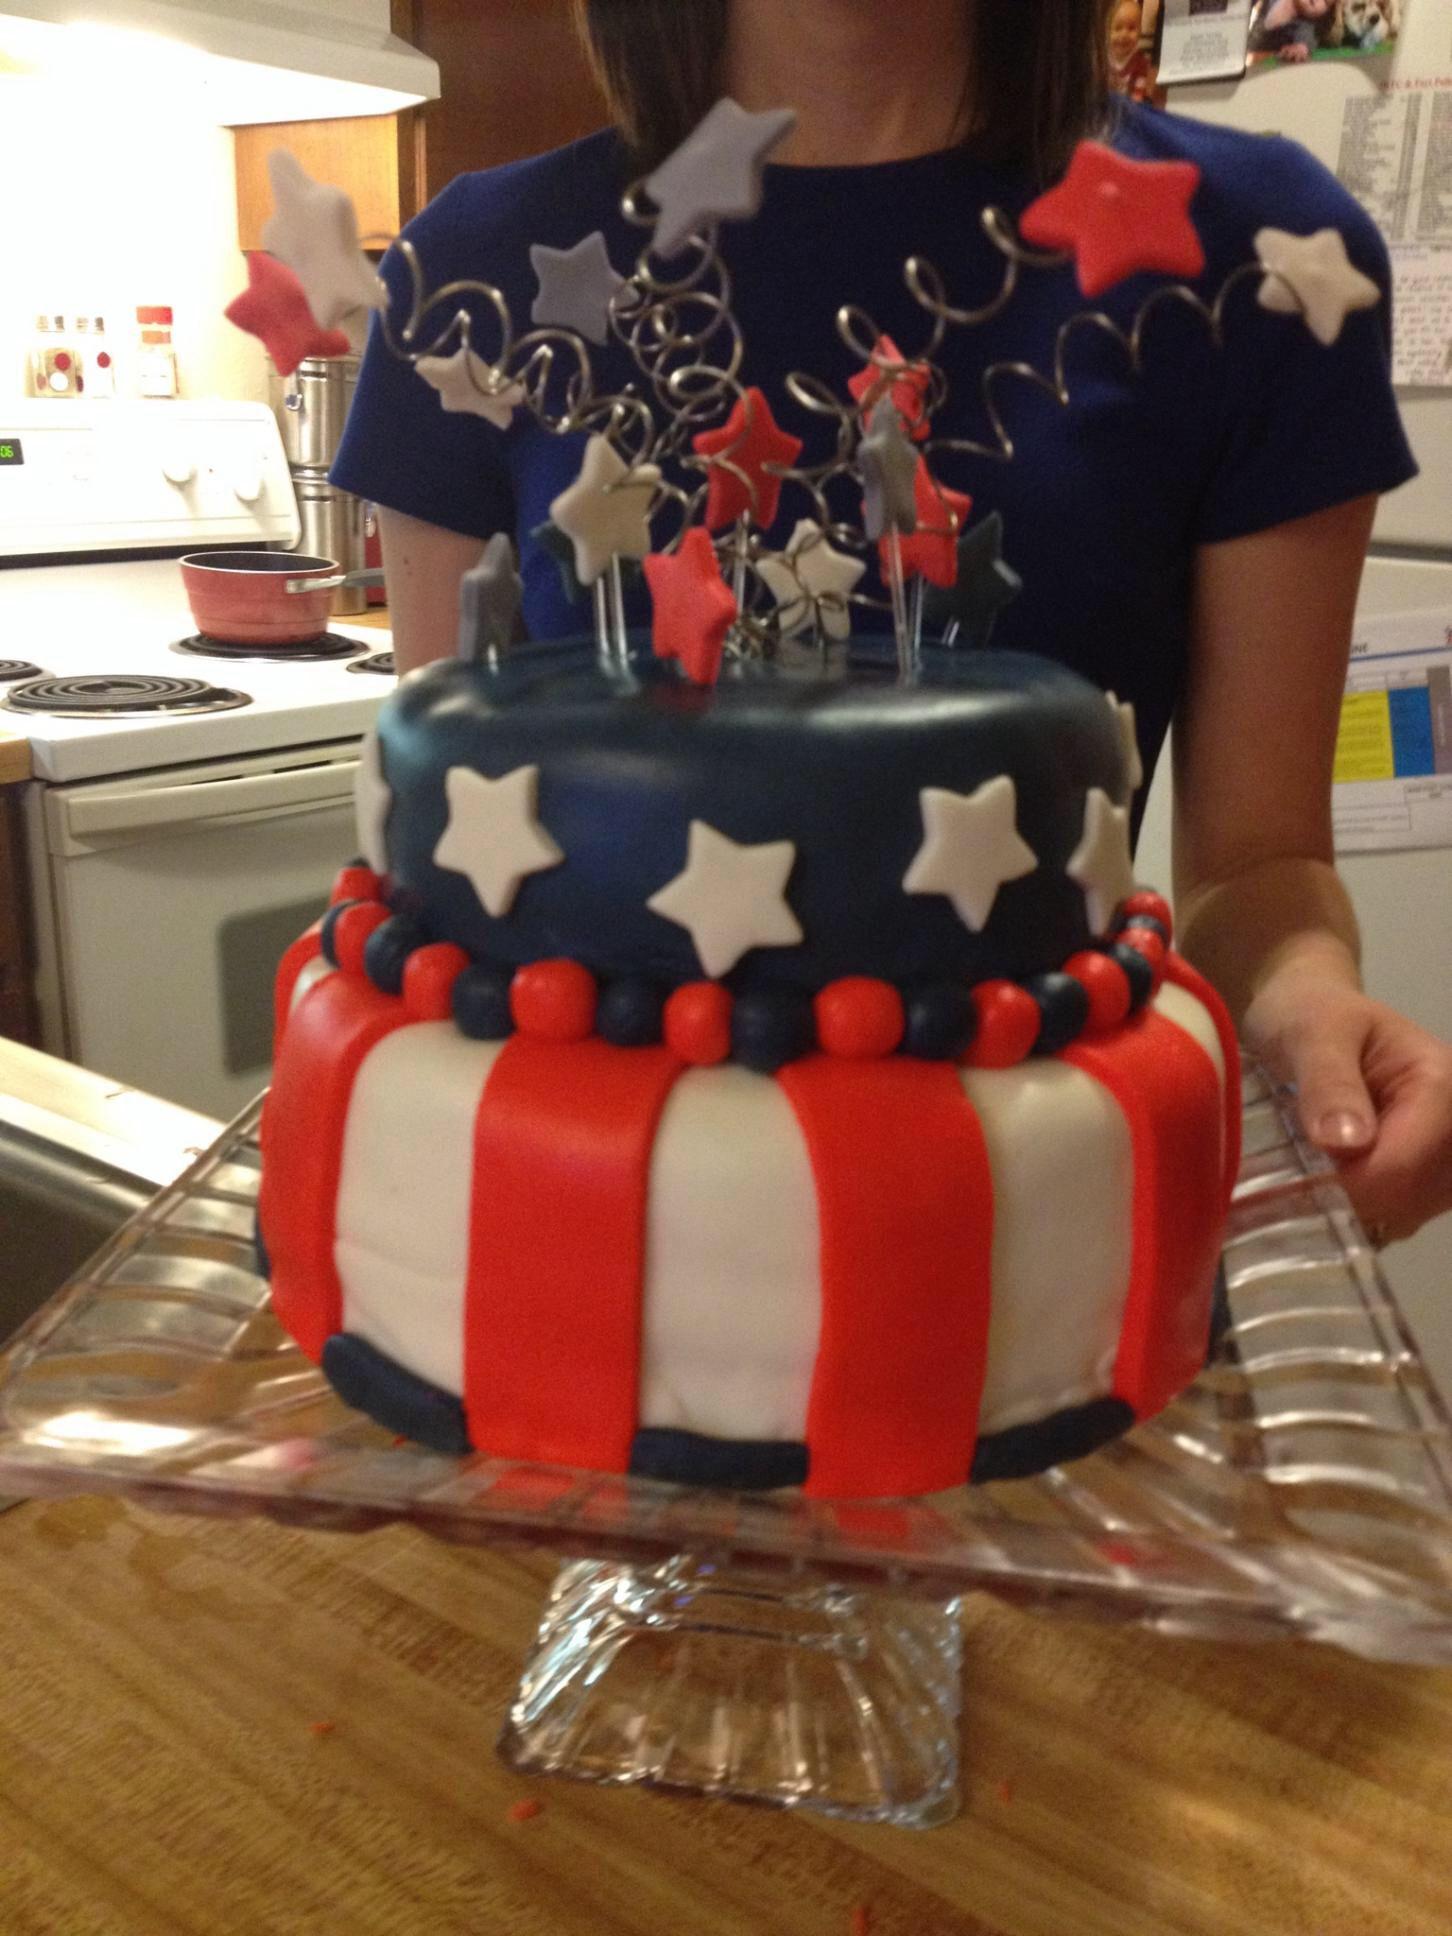 Welcome home military cake ideas 51989 military welcome ho for Military welcome home party decorations